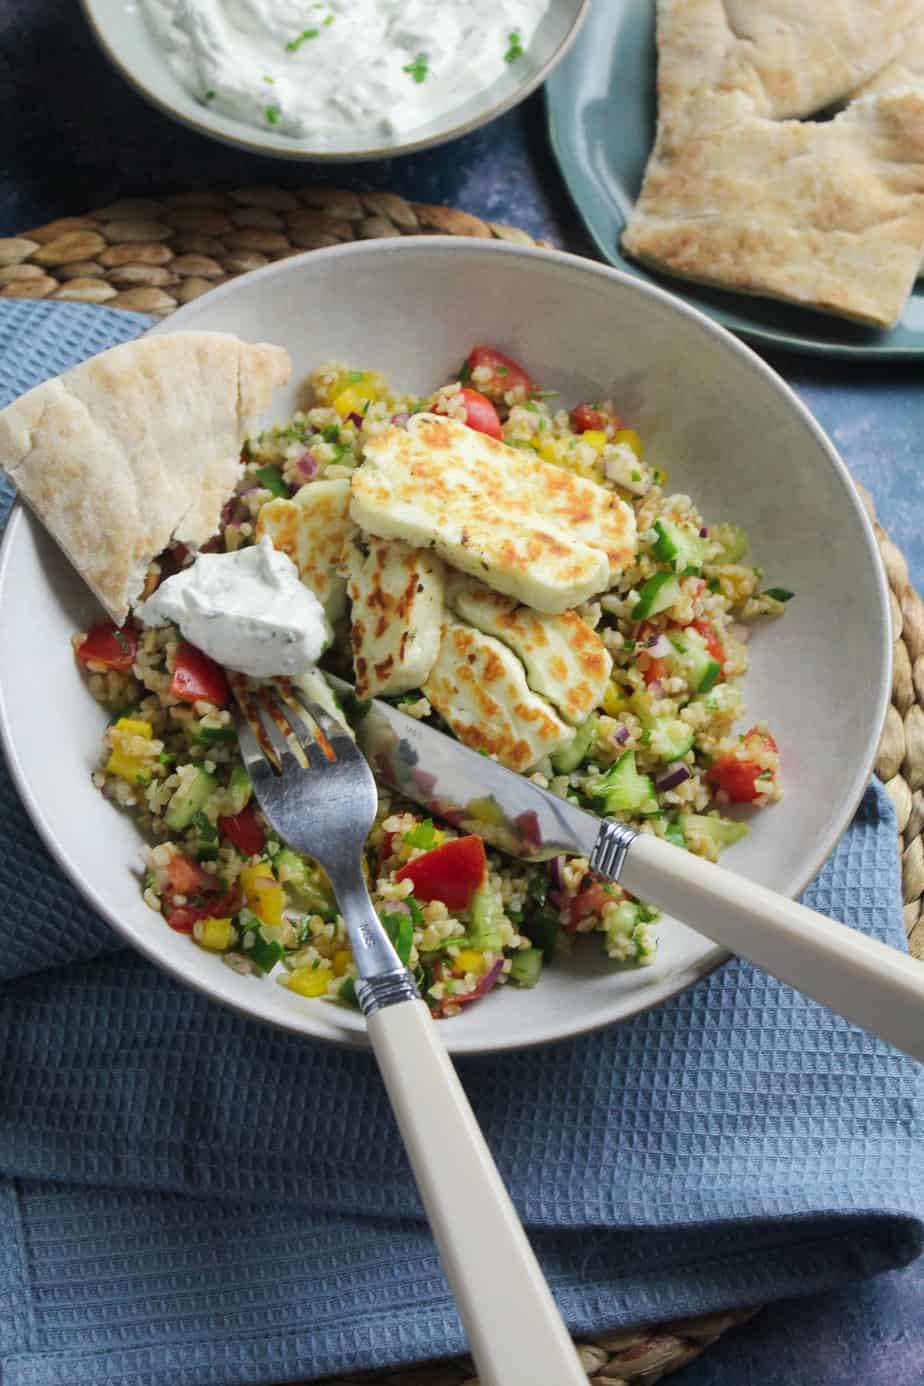 Mediterranean Halloumi and Bulgur Wheat Salad